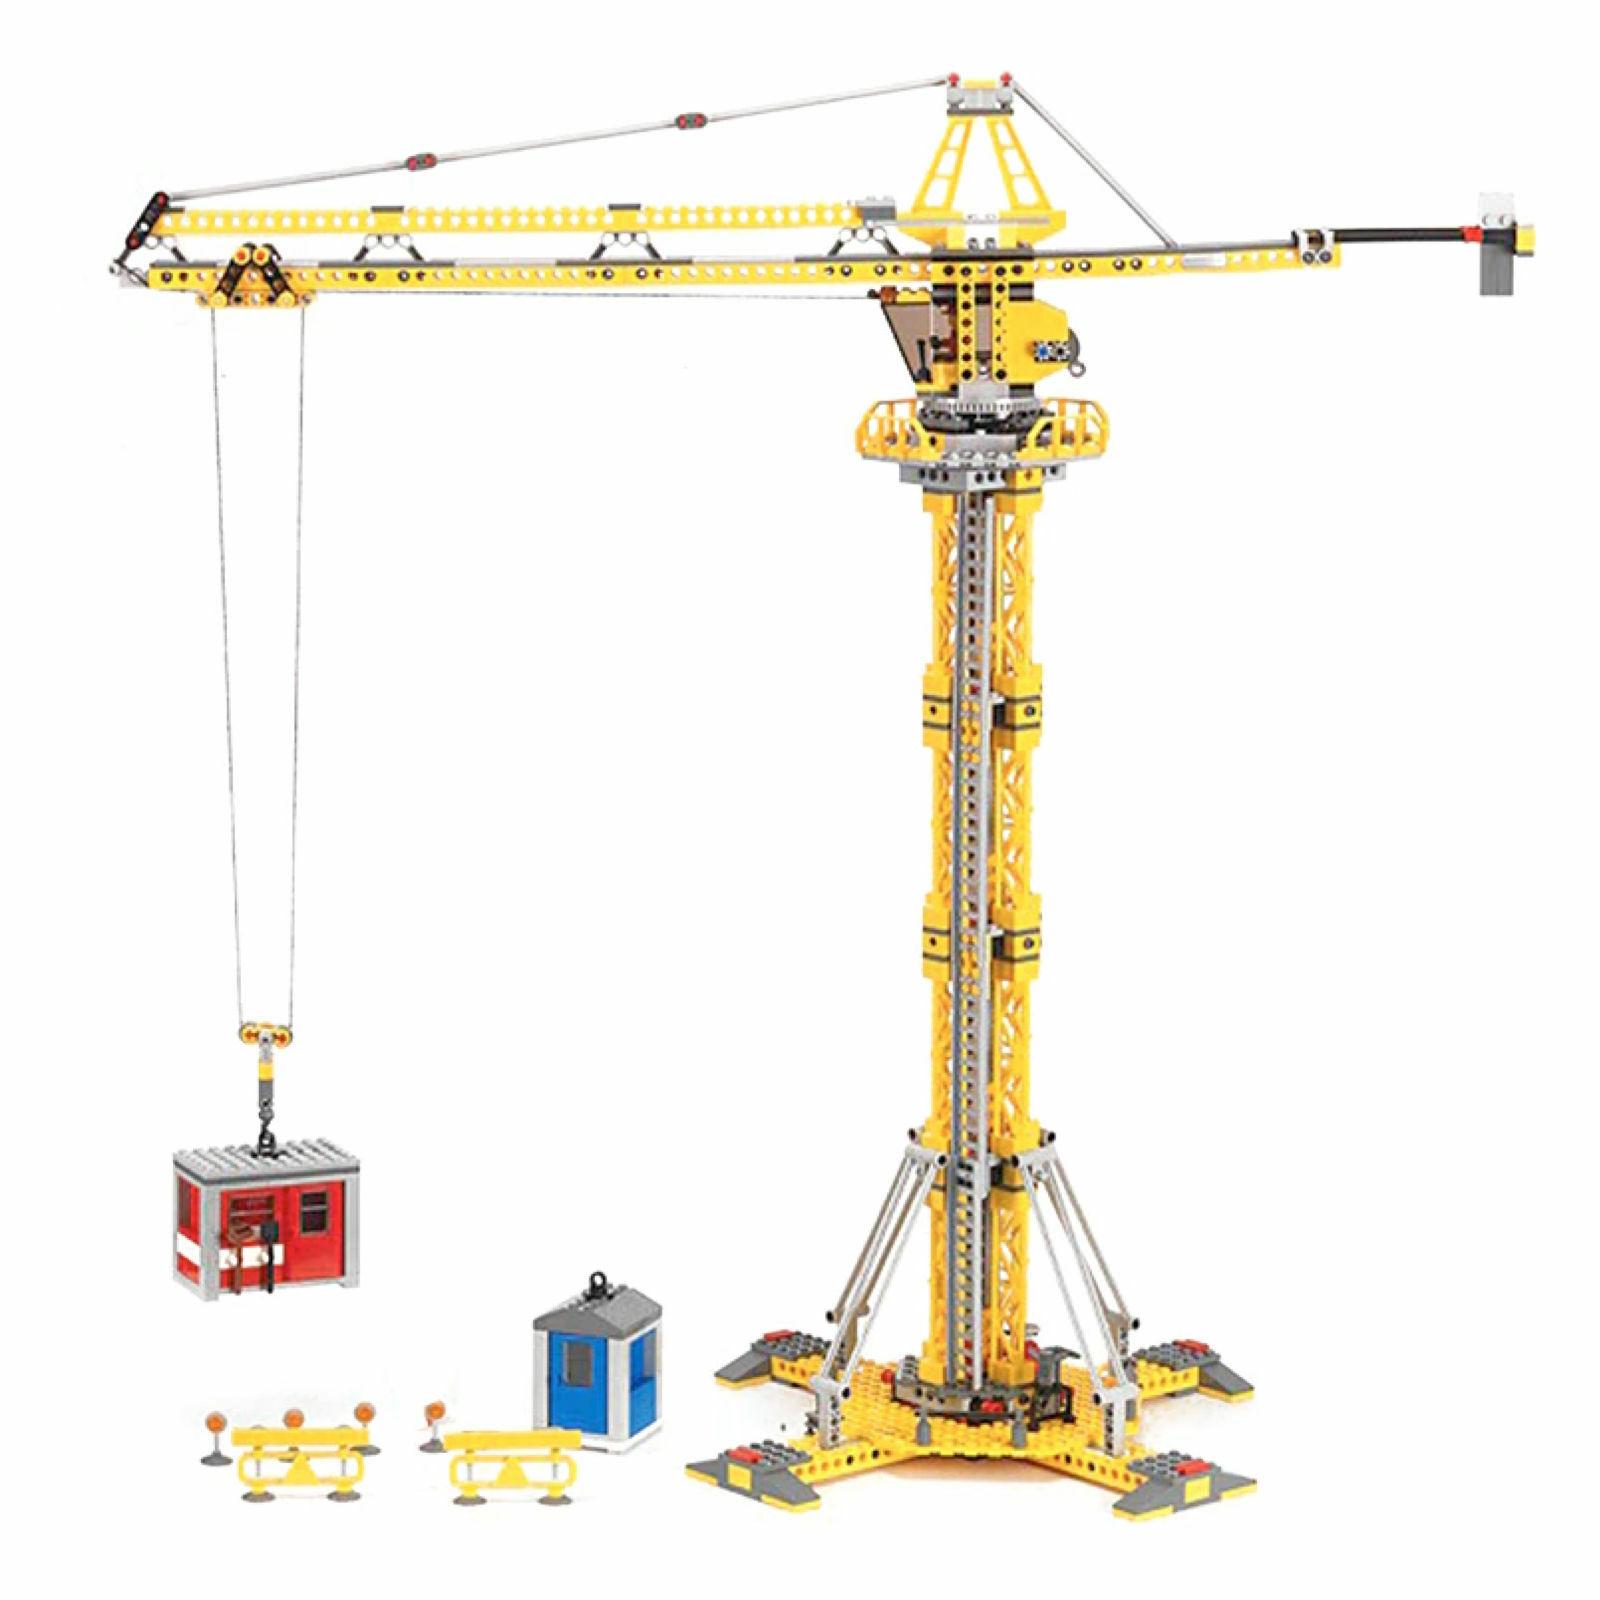 Tower crane CX 02069 Modell kits Stadt 7905 Stadt serie Genuine 778Pcs building